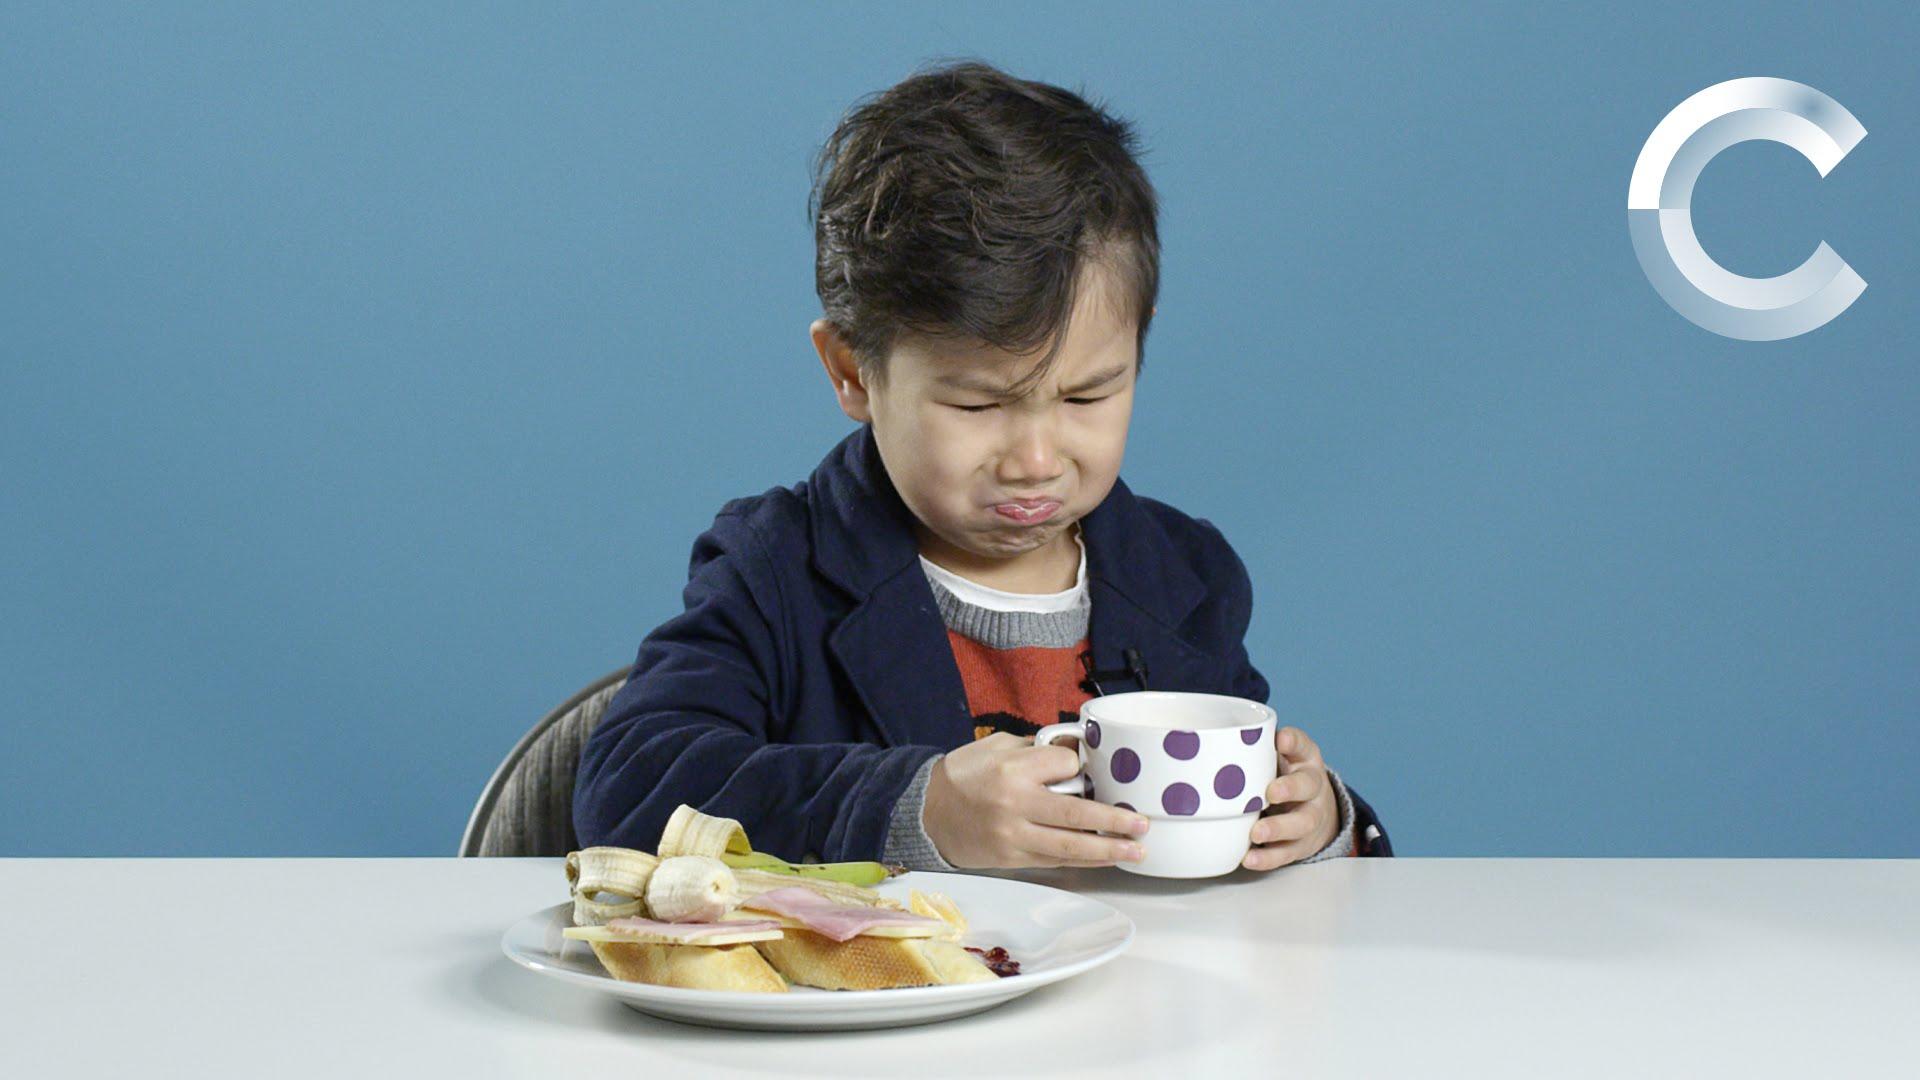 「小朋友試吃各國早餐--天啊!碗裡有死魚?!」- American Kids Try Breakfasts From Around the World